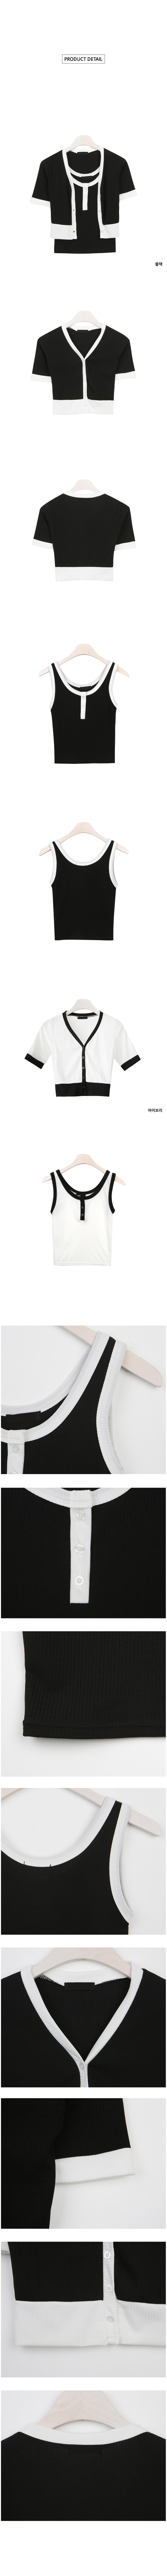 Lian Nashi + cardigan set T#YW603